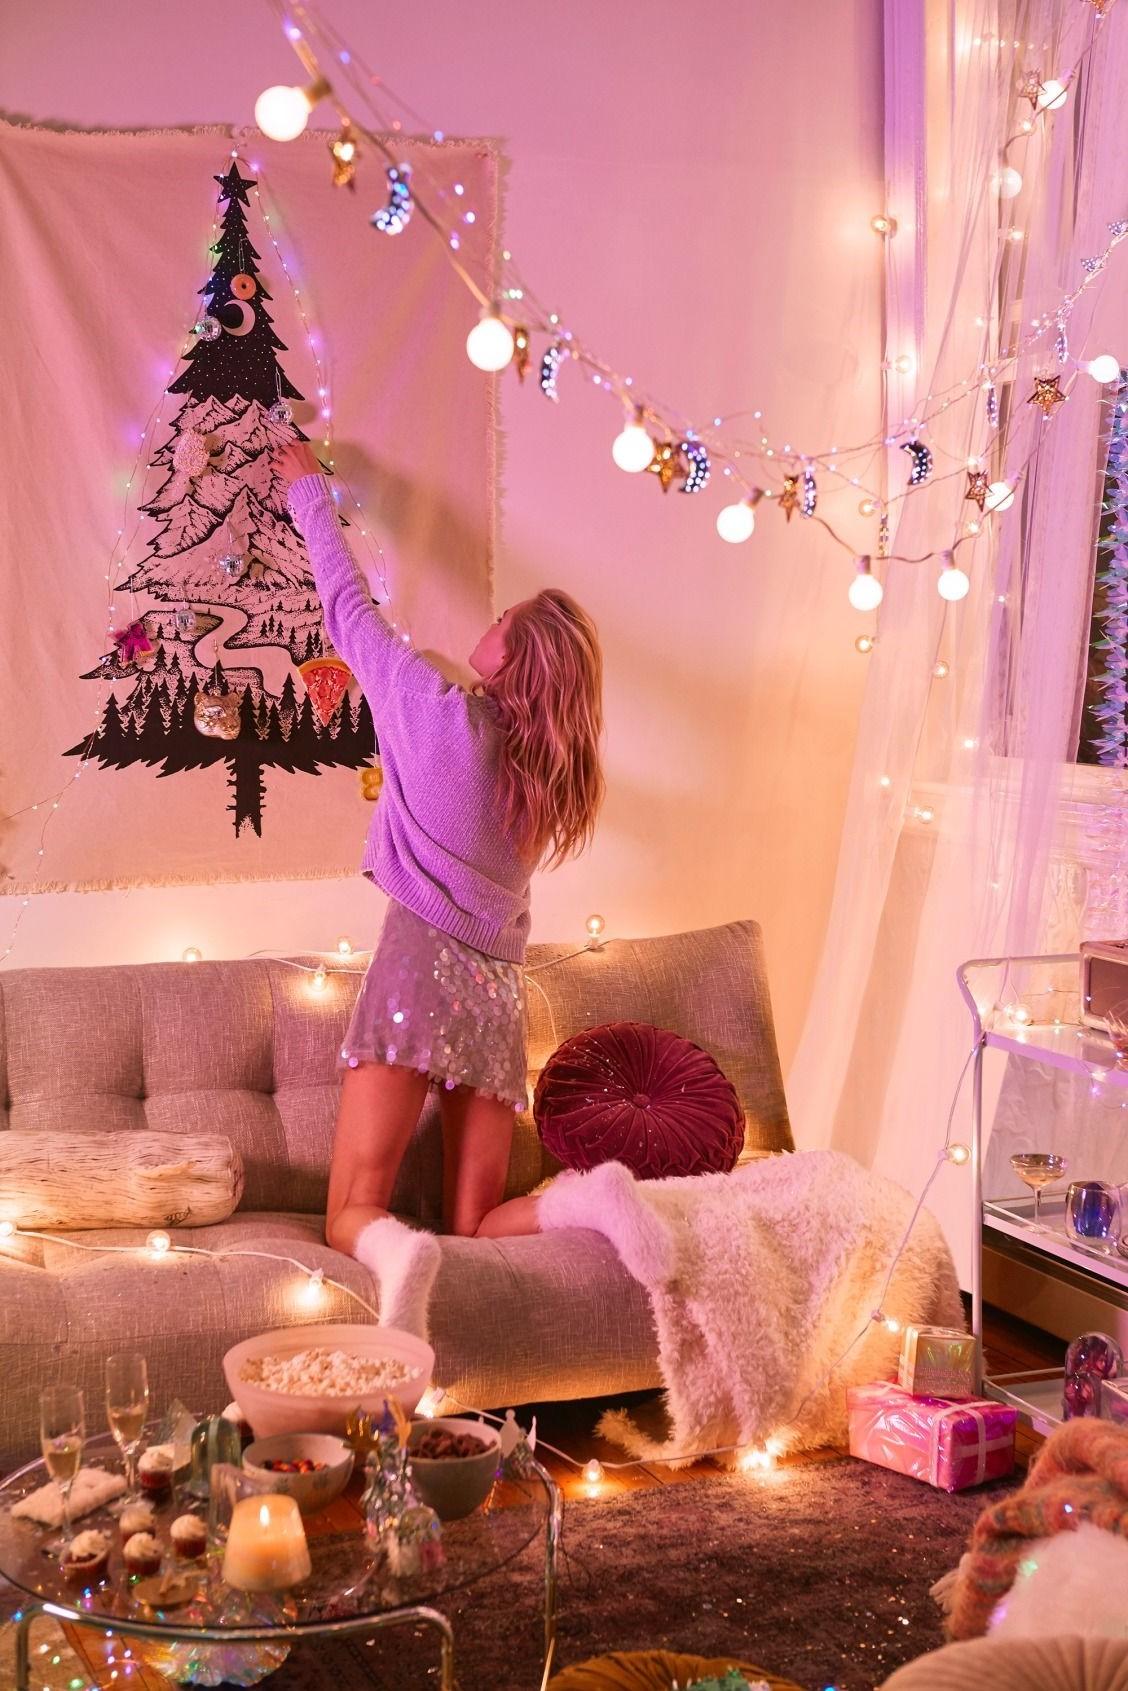 Décoration de Noël avec guirlande lumineuse.